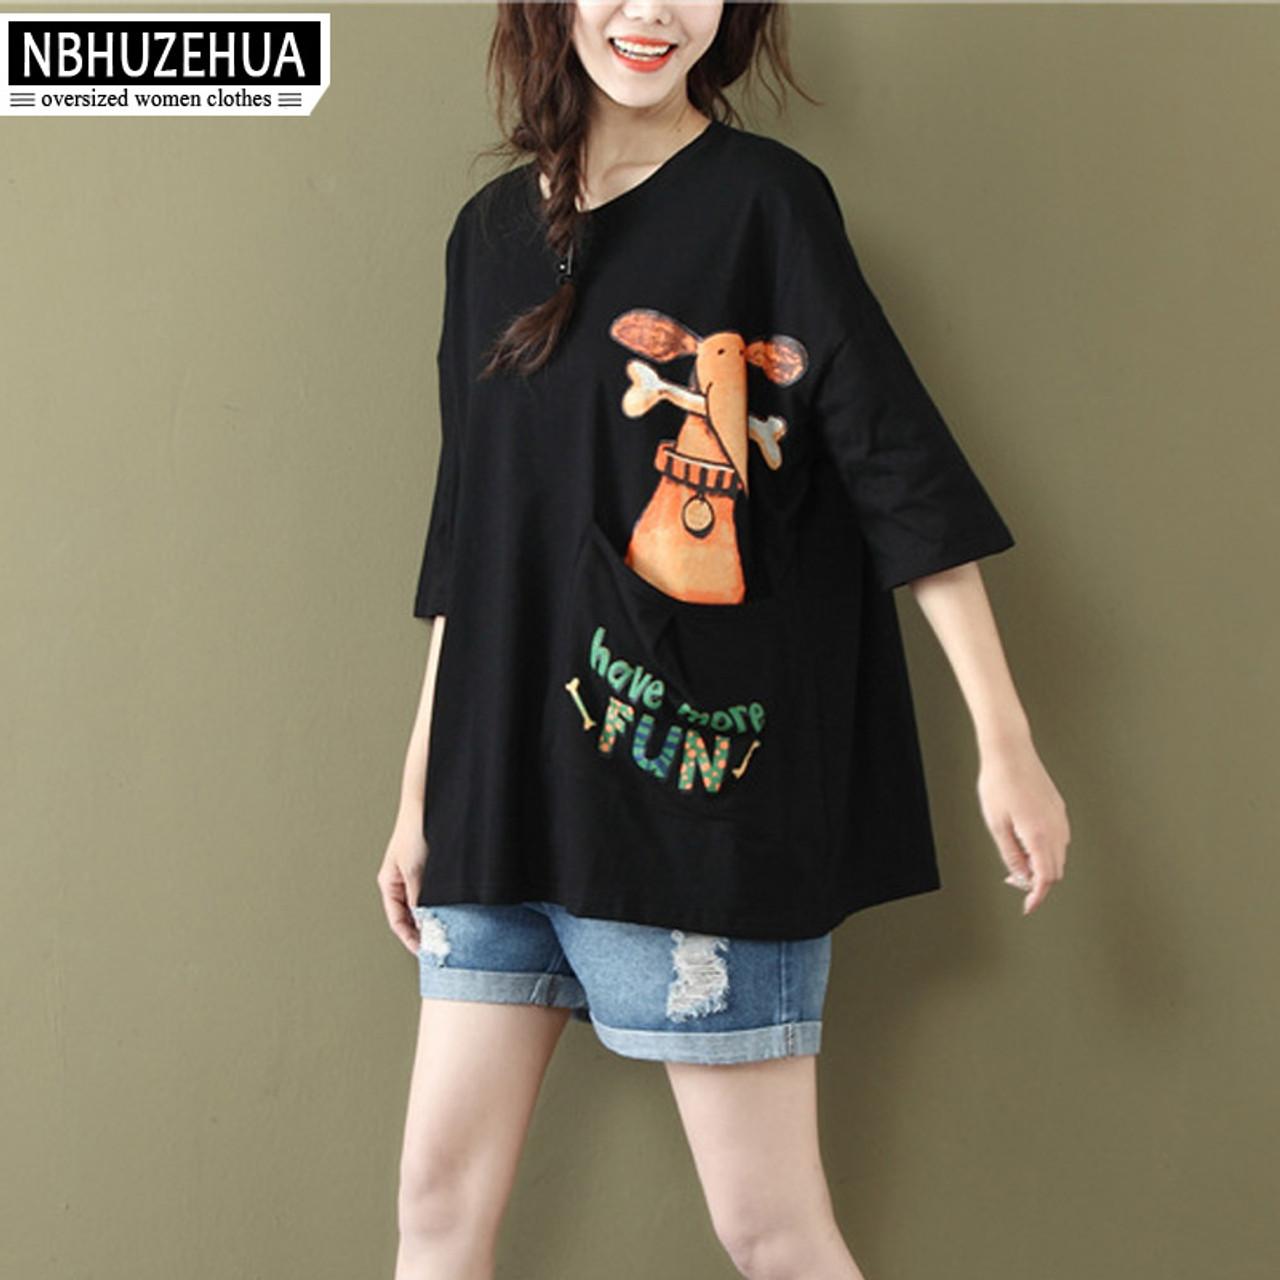 7be908f9d ... NBHUZEHUA A56 Women's Kawaii Funny T Shirts Cartoon Dog Print Women  Tops Summer Tshirt Plus Size ...